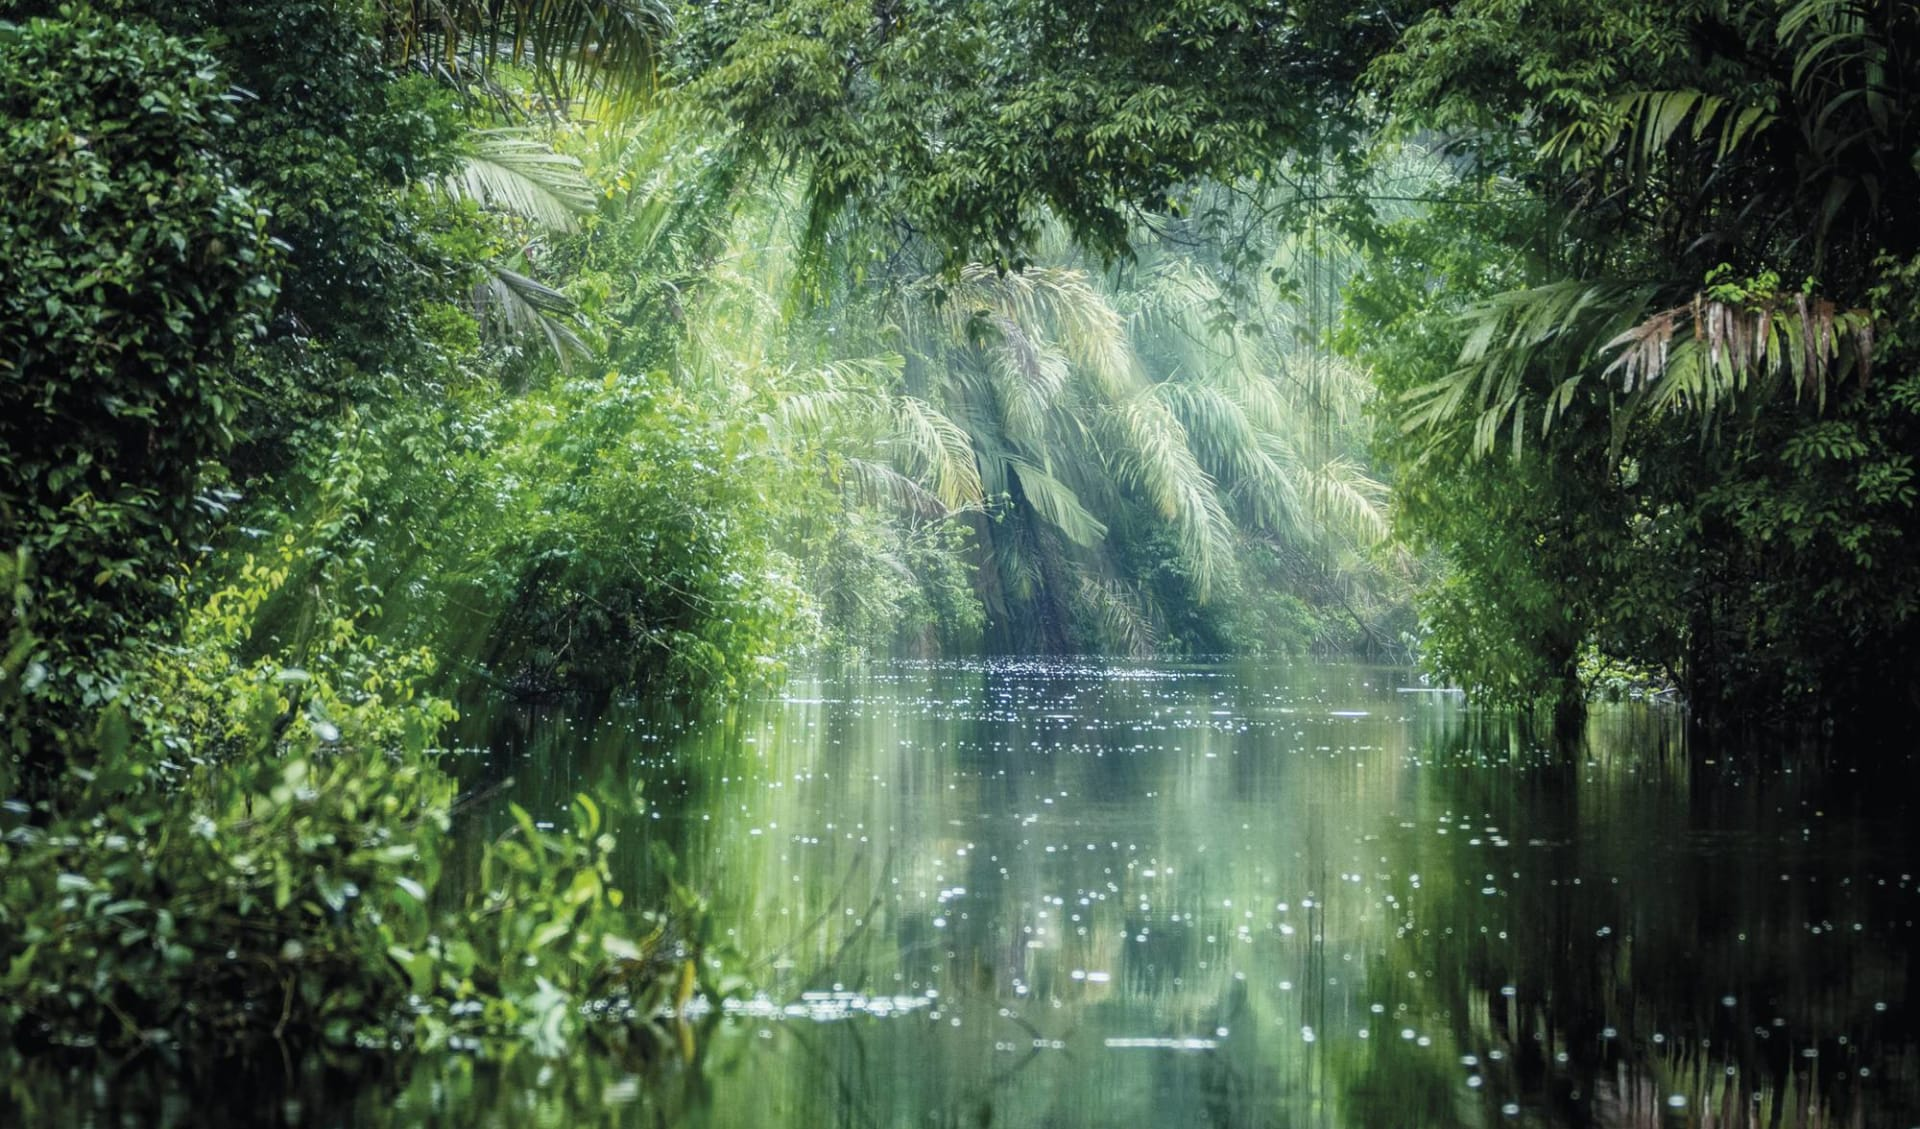 Privatreise Karibik mal anders ab San José City: Costa Rica - Tortuguero Nationalpark - Regenwald